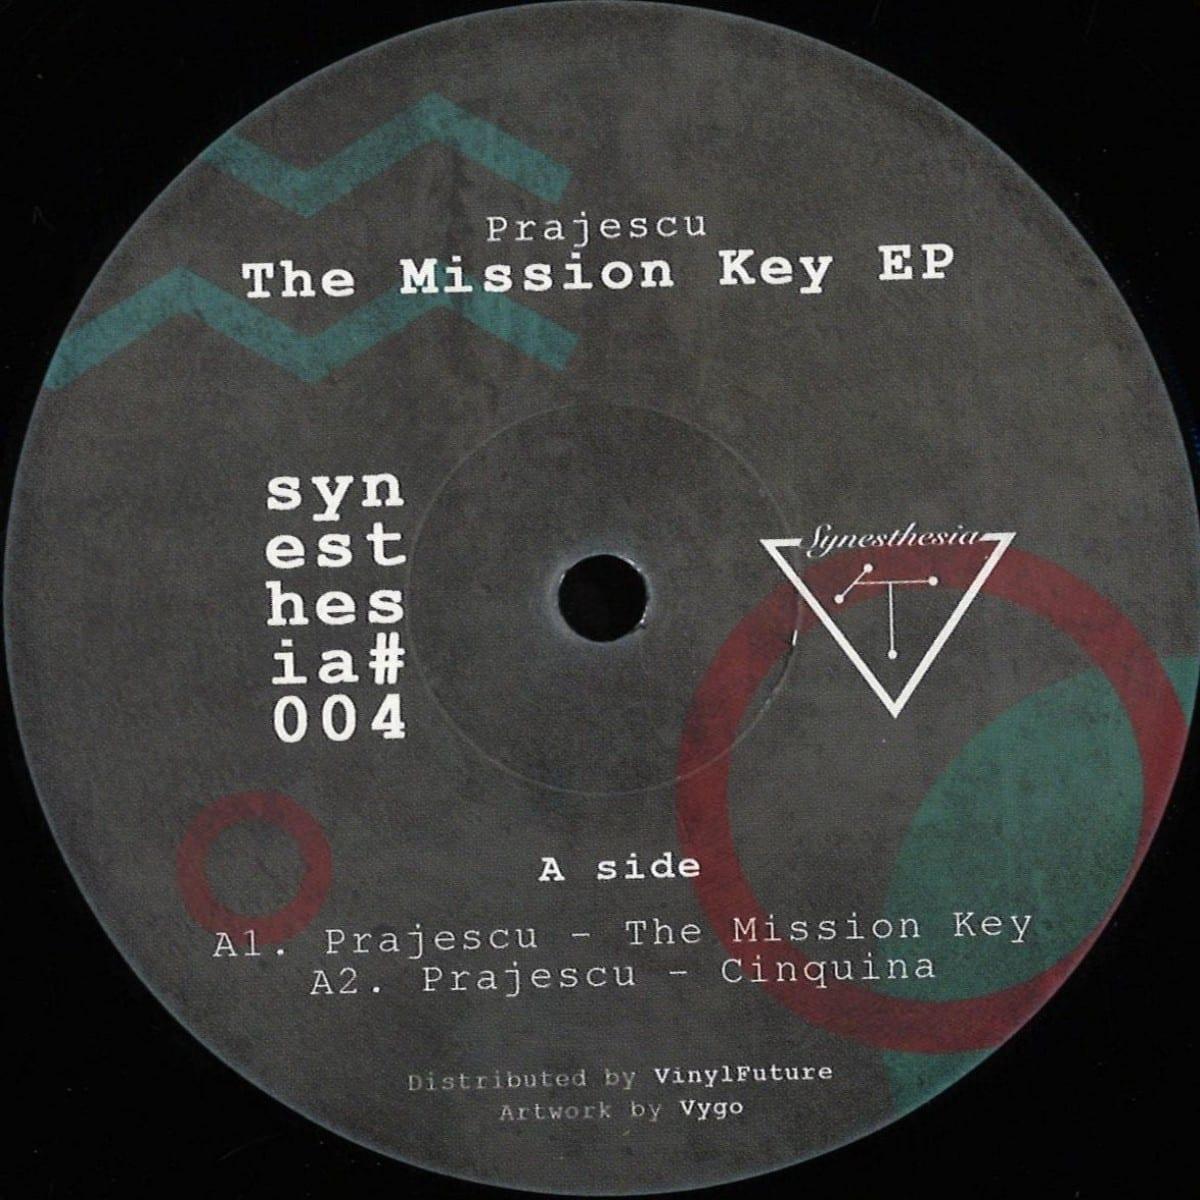 Prajescu - The Mission Key EP [Synesthesia] 01